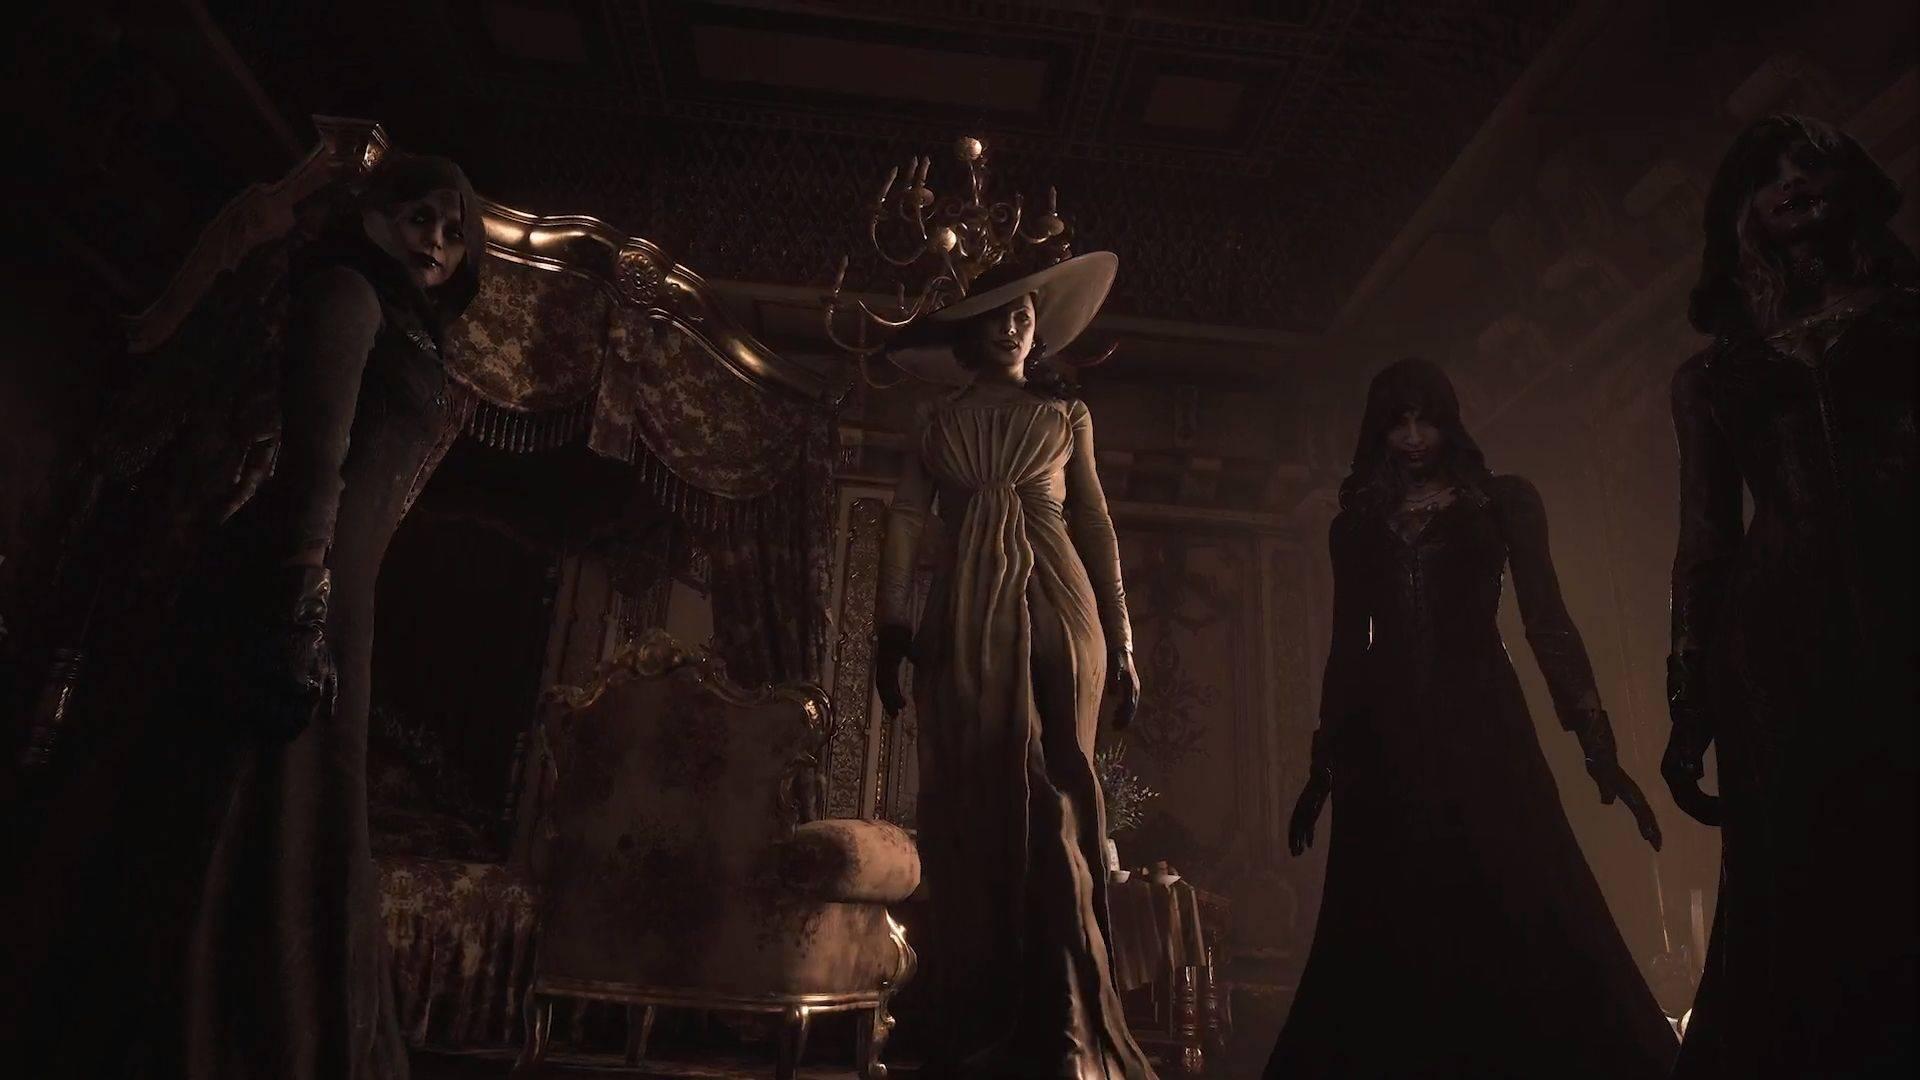 Трейлеры Village и Infinite Darkness — что показали на презентации Resident Evil 1